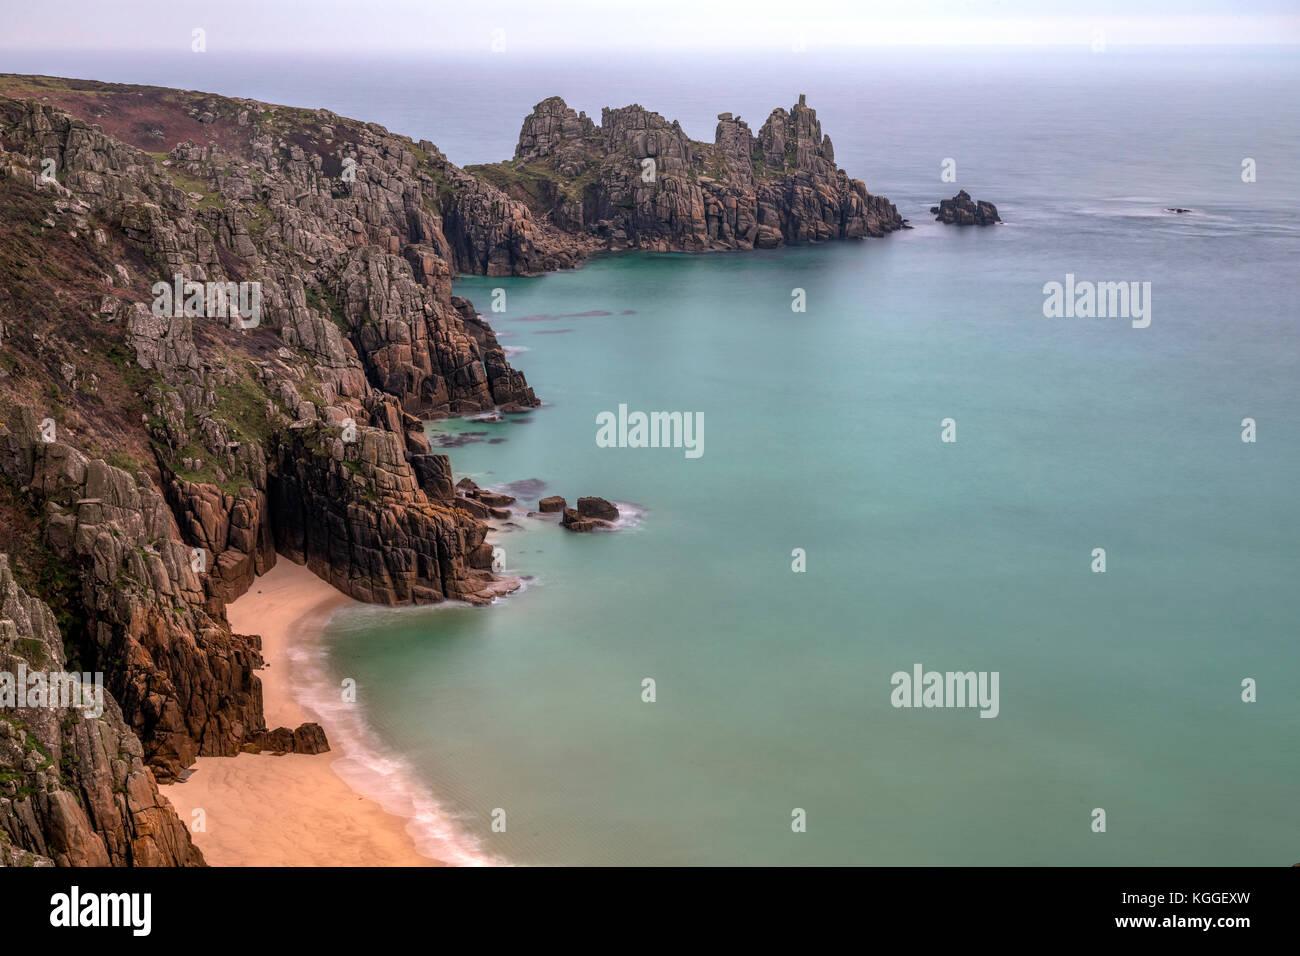 Logan Rock, Penwith Peninsula, Cornwall, England, United Kingdom - Stock Image